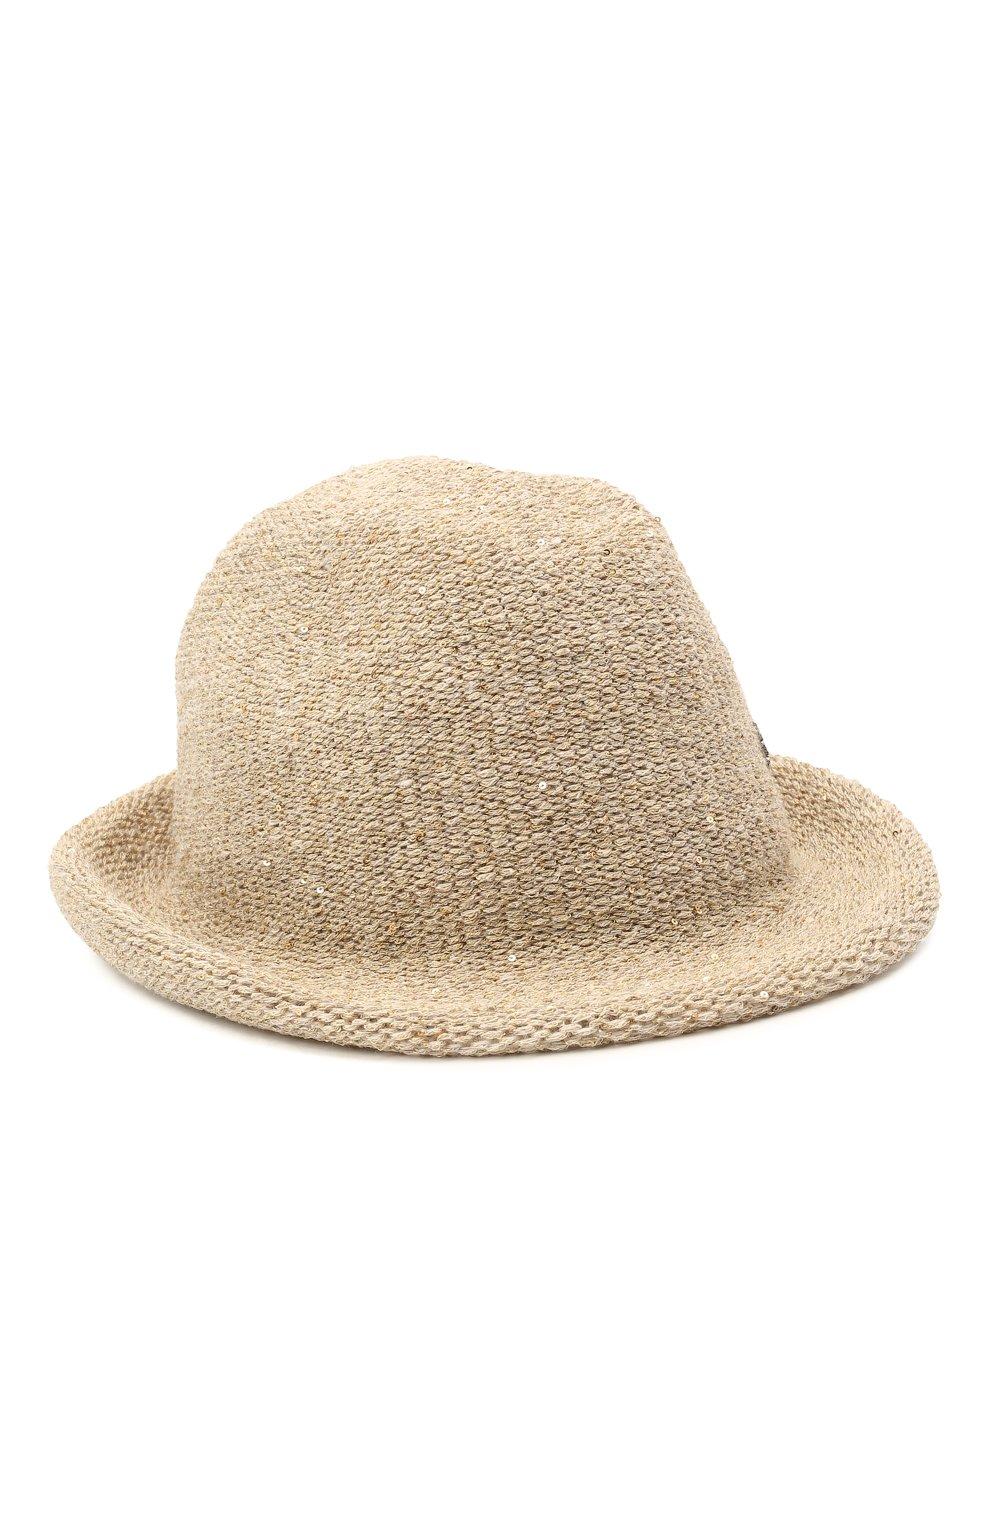 Женская шляпа LORENA ANTONIAZZI бежевого цвета, арт. P2189CE002/2815 | Фото 1 (Материал: Текстиль, Лен)